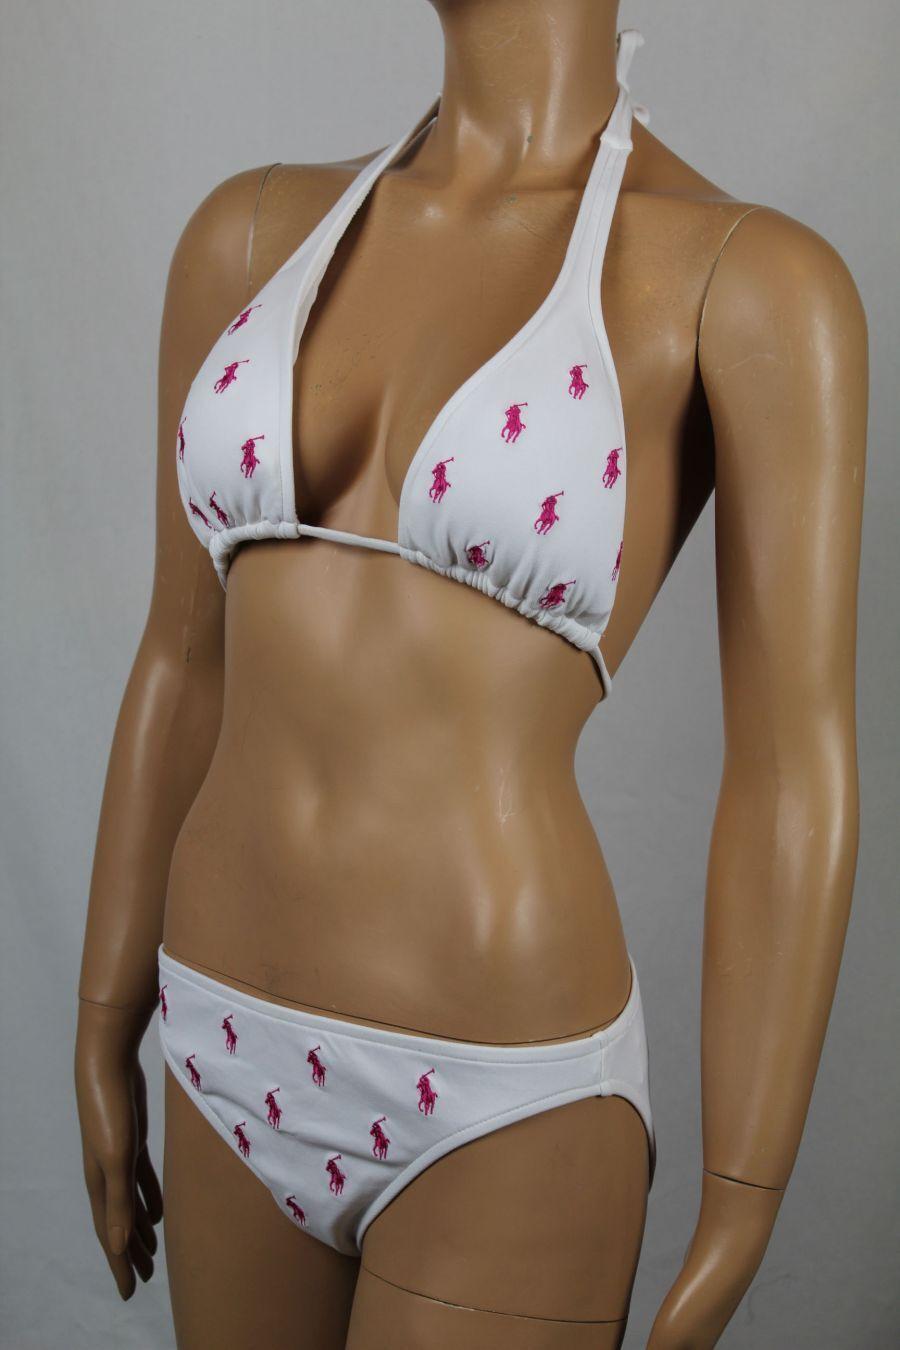 Ralph Lauren Small S White Bikini Multi Pink Pony Logo NWT